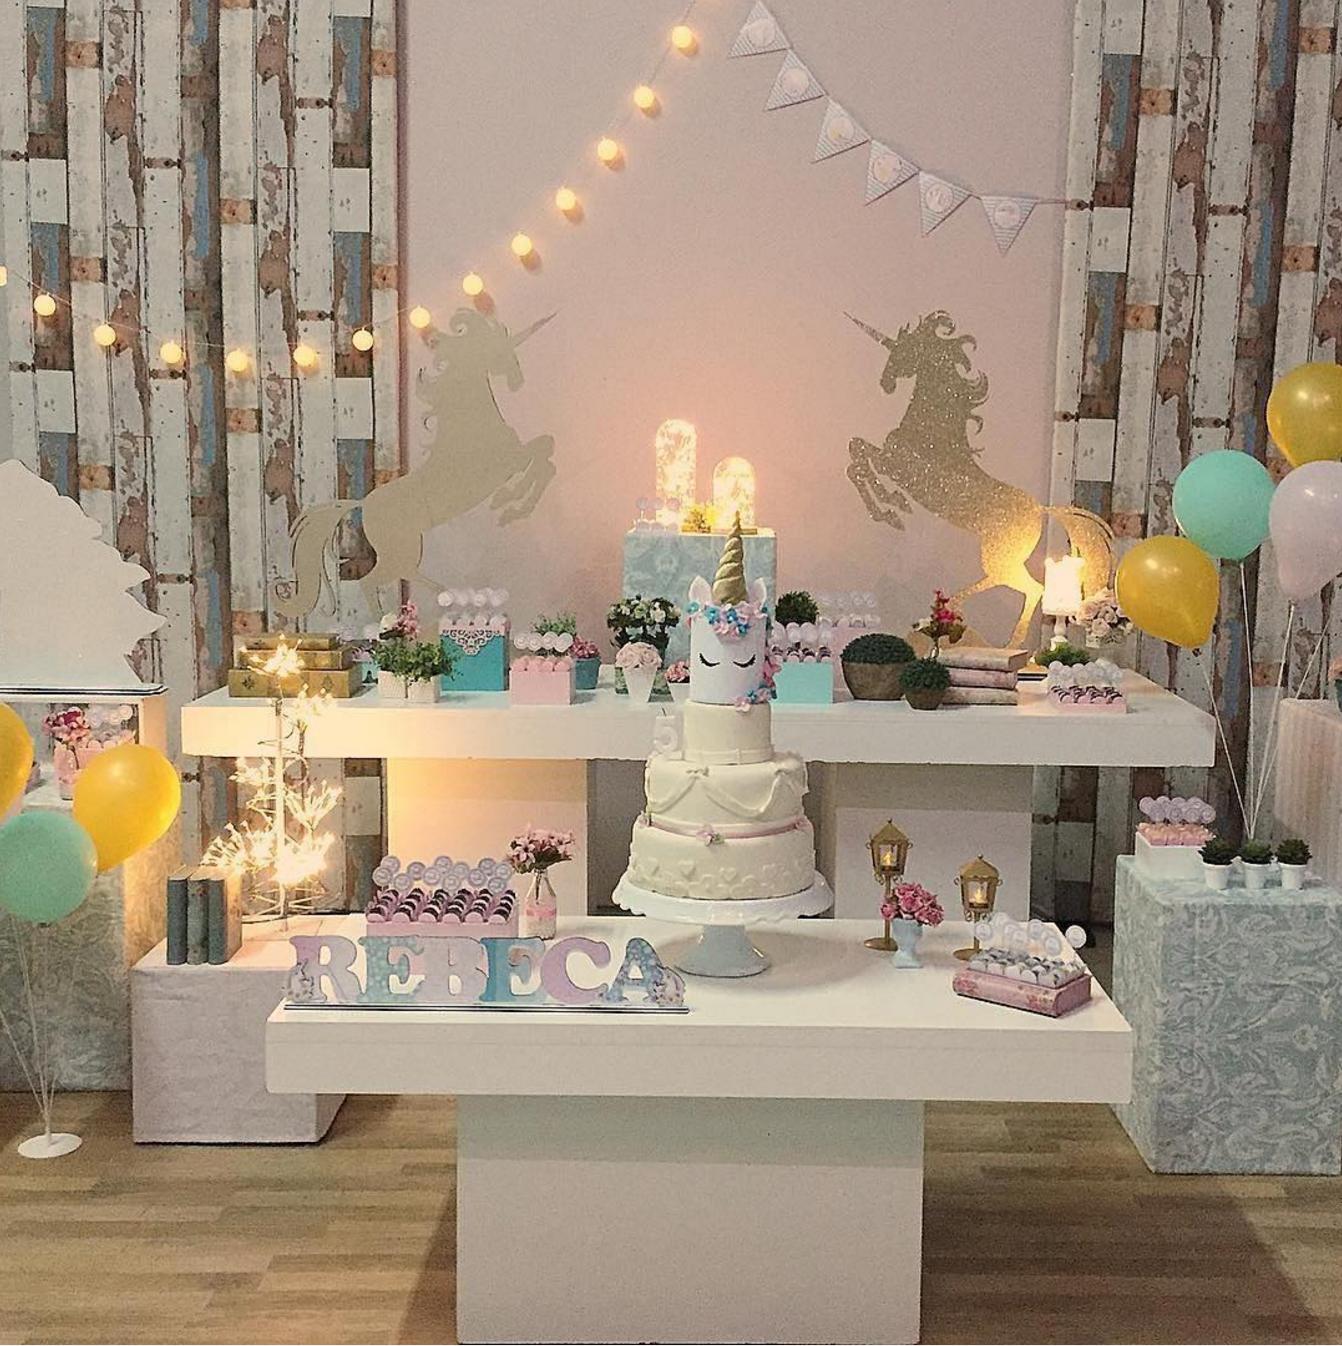 101 fiestas ideas para decorar tu fiesta de unicornio for Decoracion para pared de unicornio